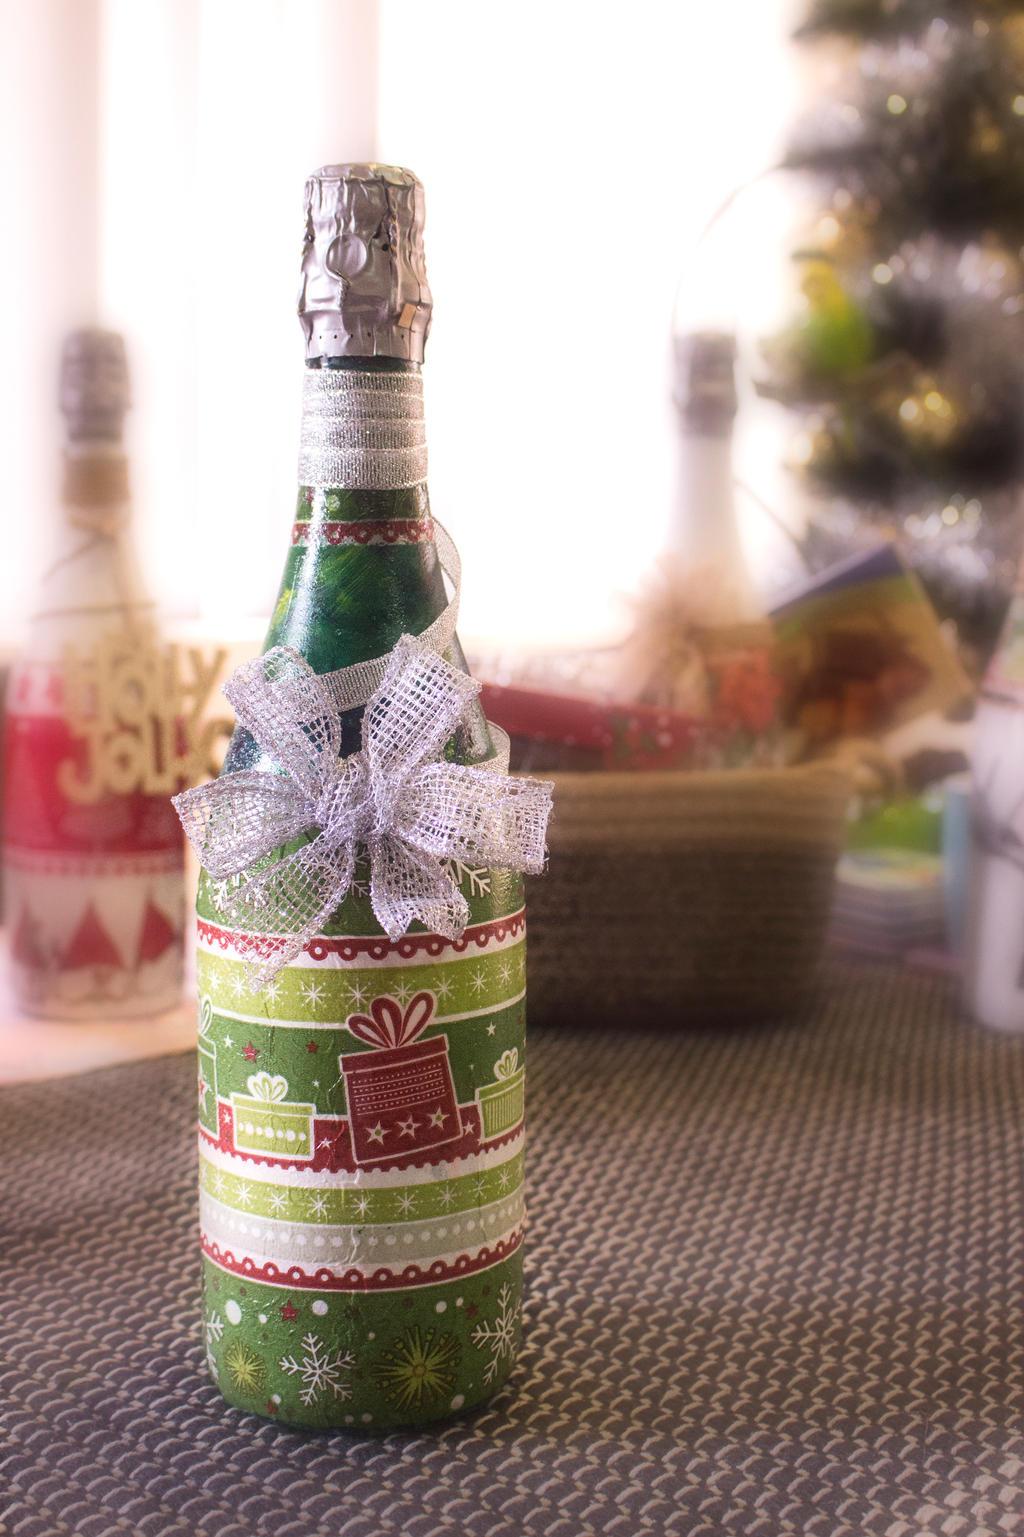 Decorative bottle 15